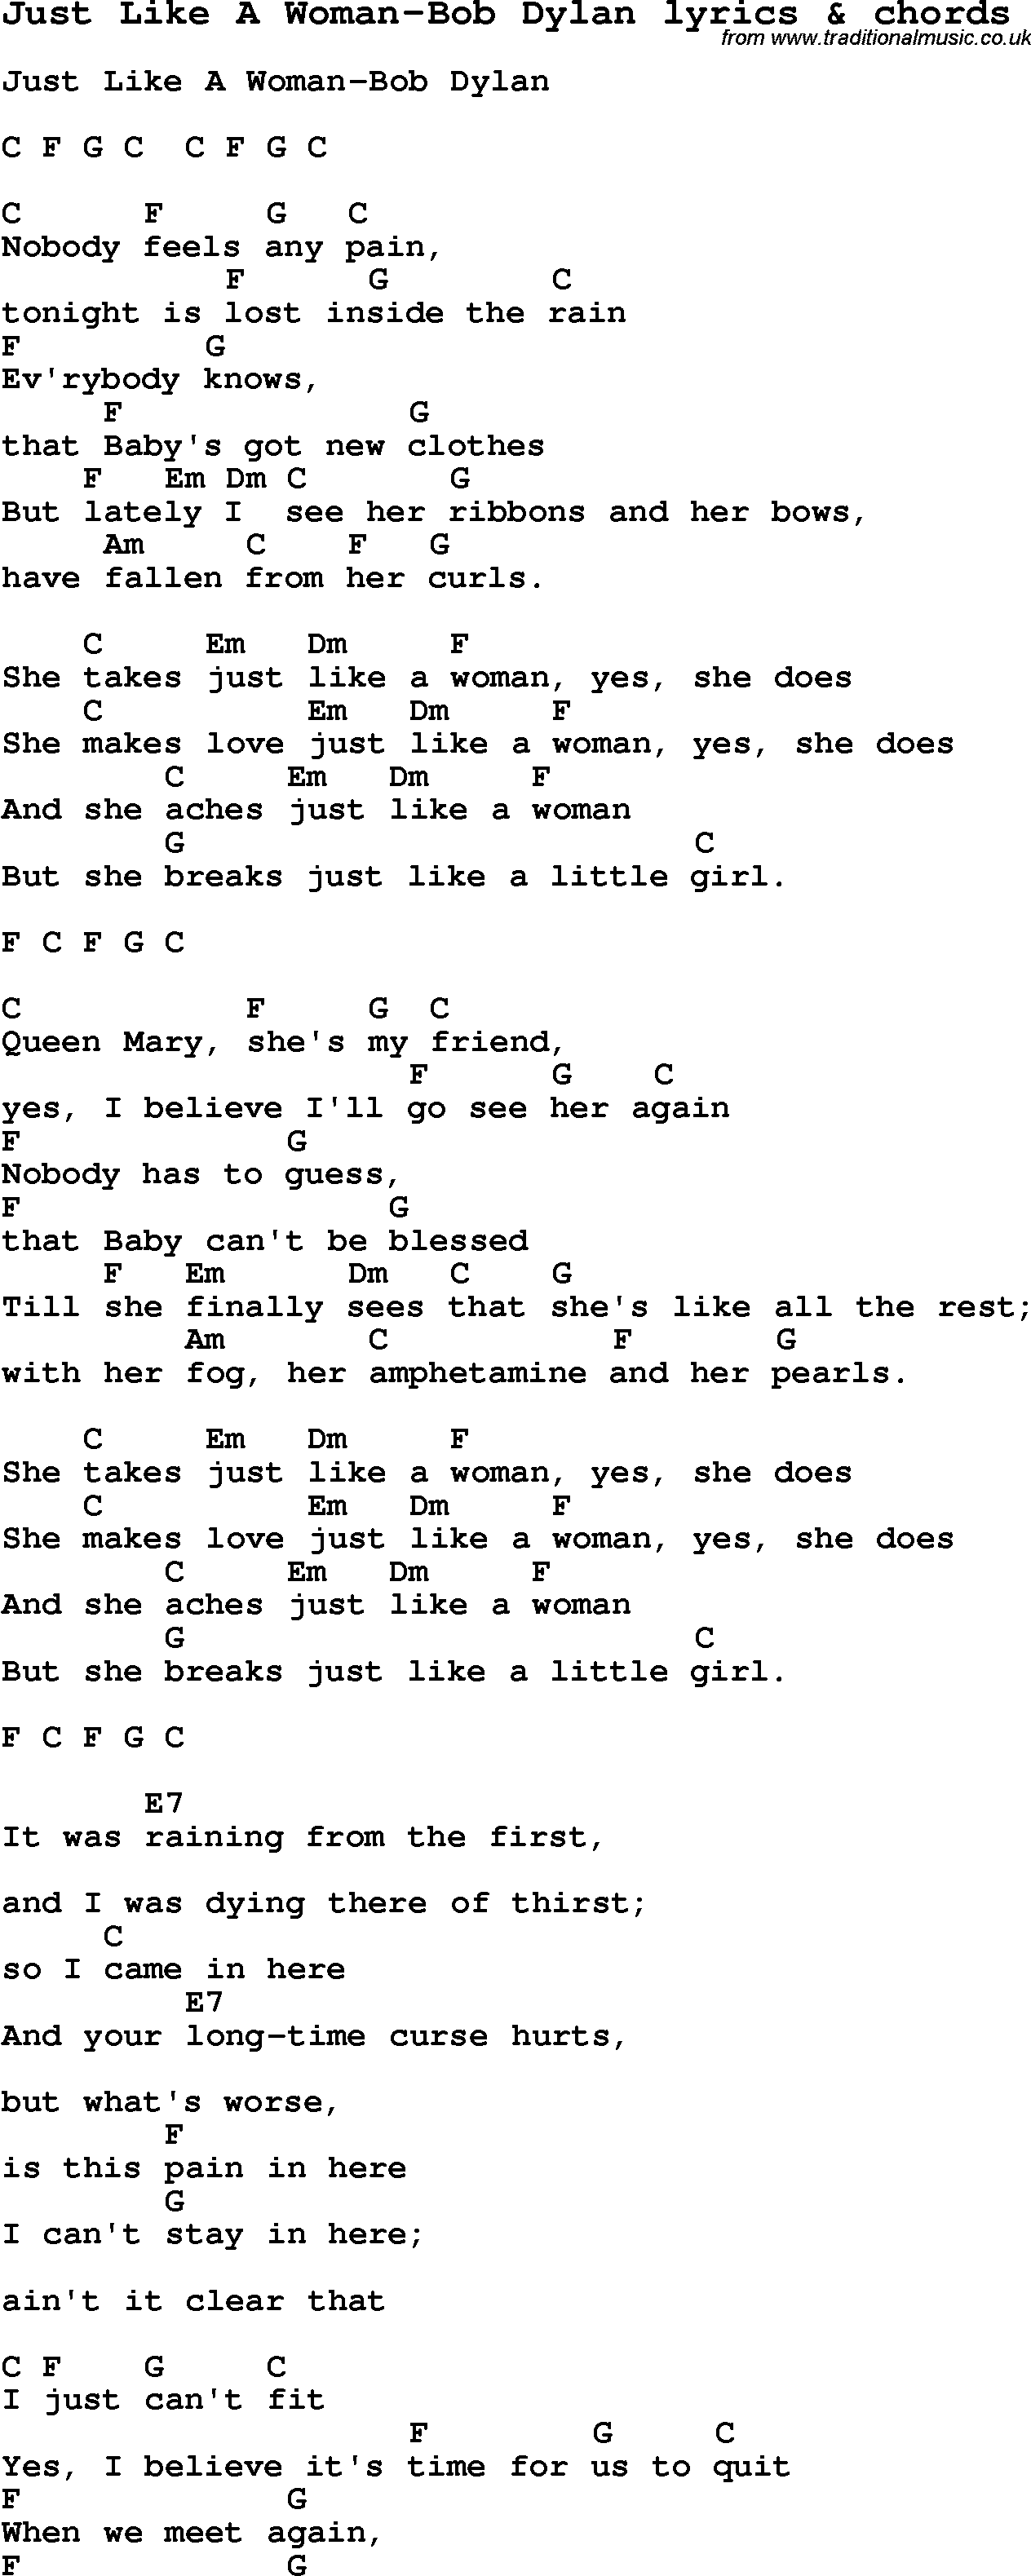 Love song lyrics for just like a woman bob dylan with chords for love song lyrics for just like a woman bob dylan with chords for ukulele hexwebz Choice Image